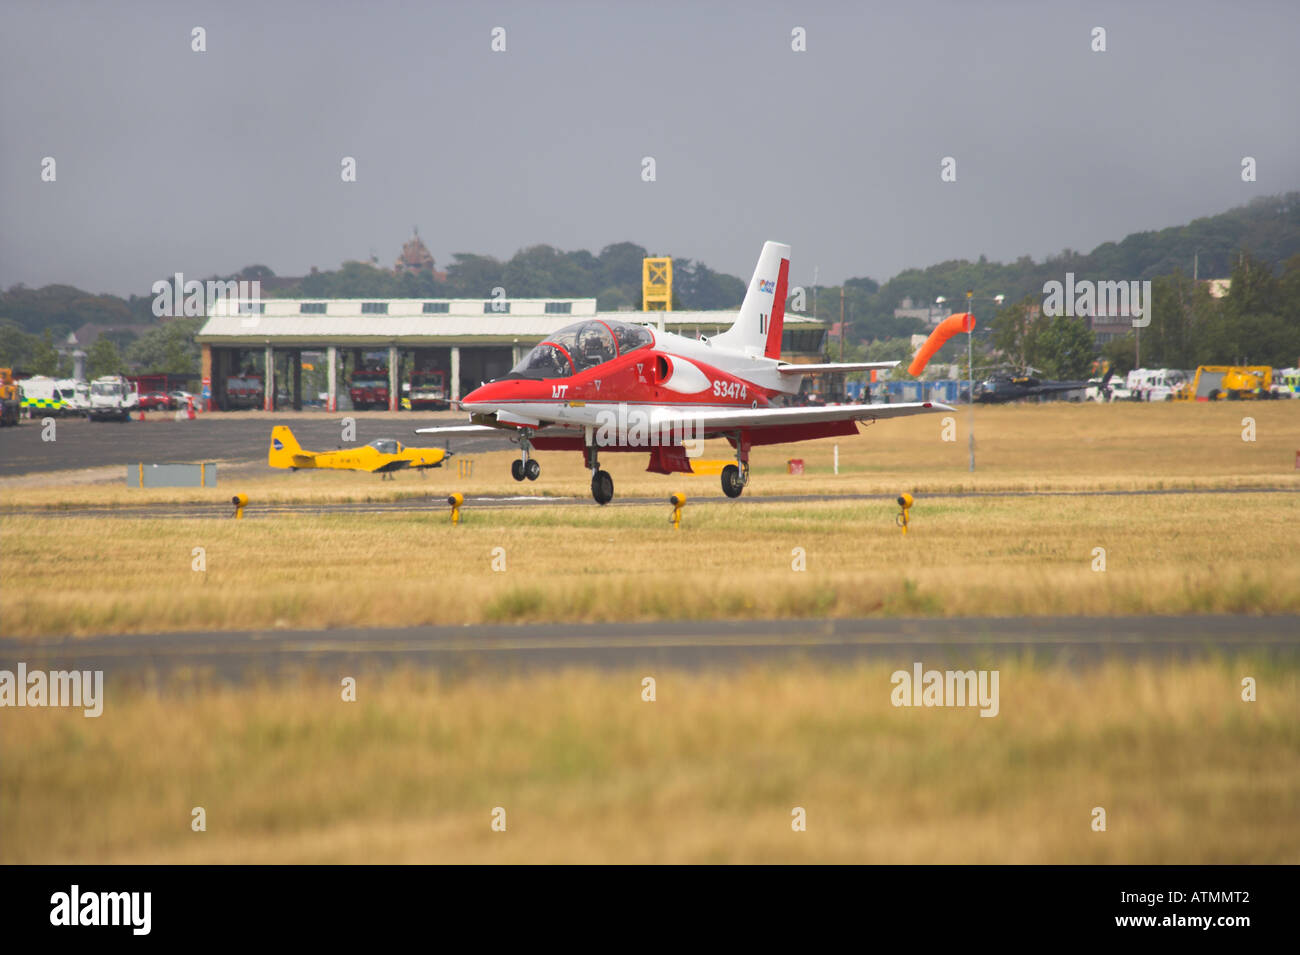 Hindustan Aeronautics Ltd IJT 36 Trainer just touching down - Stock Image